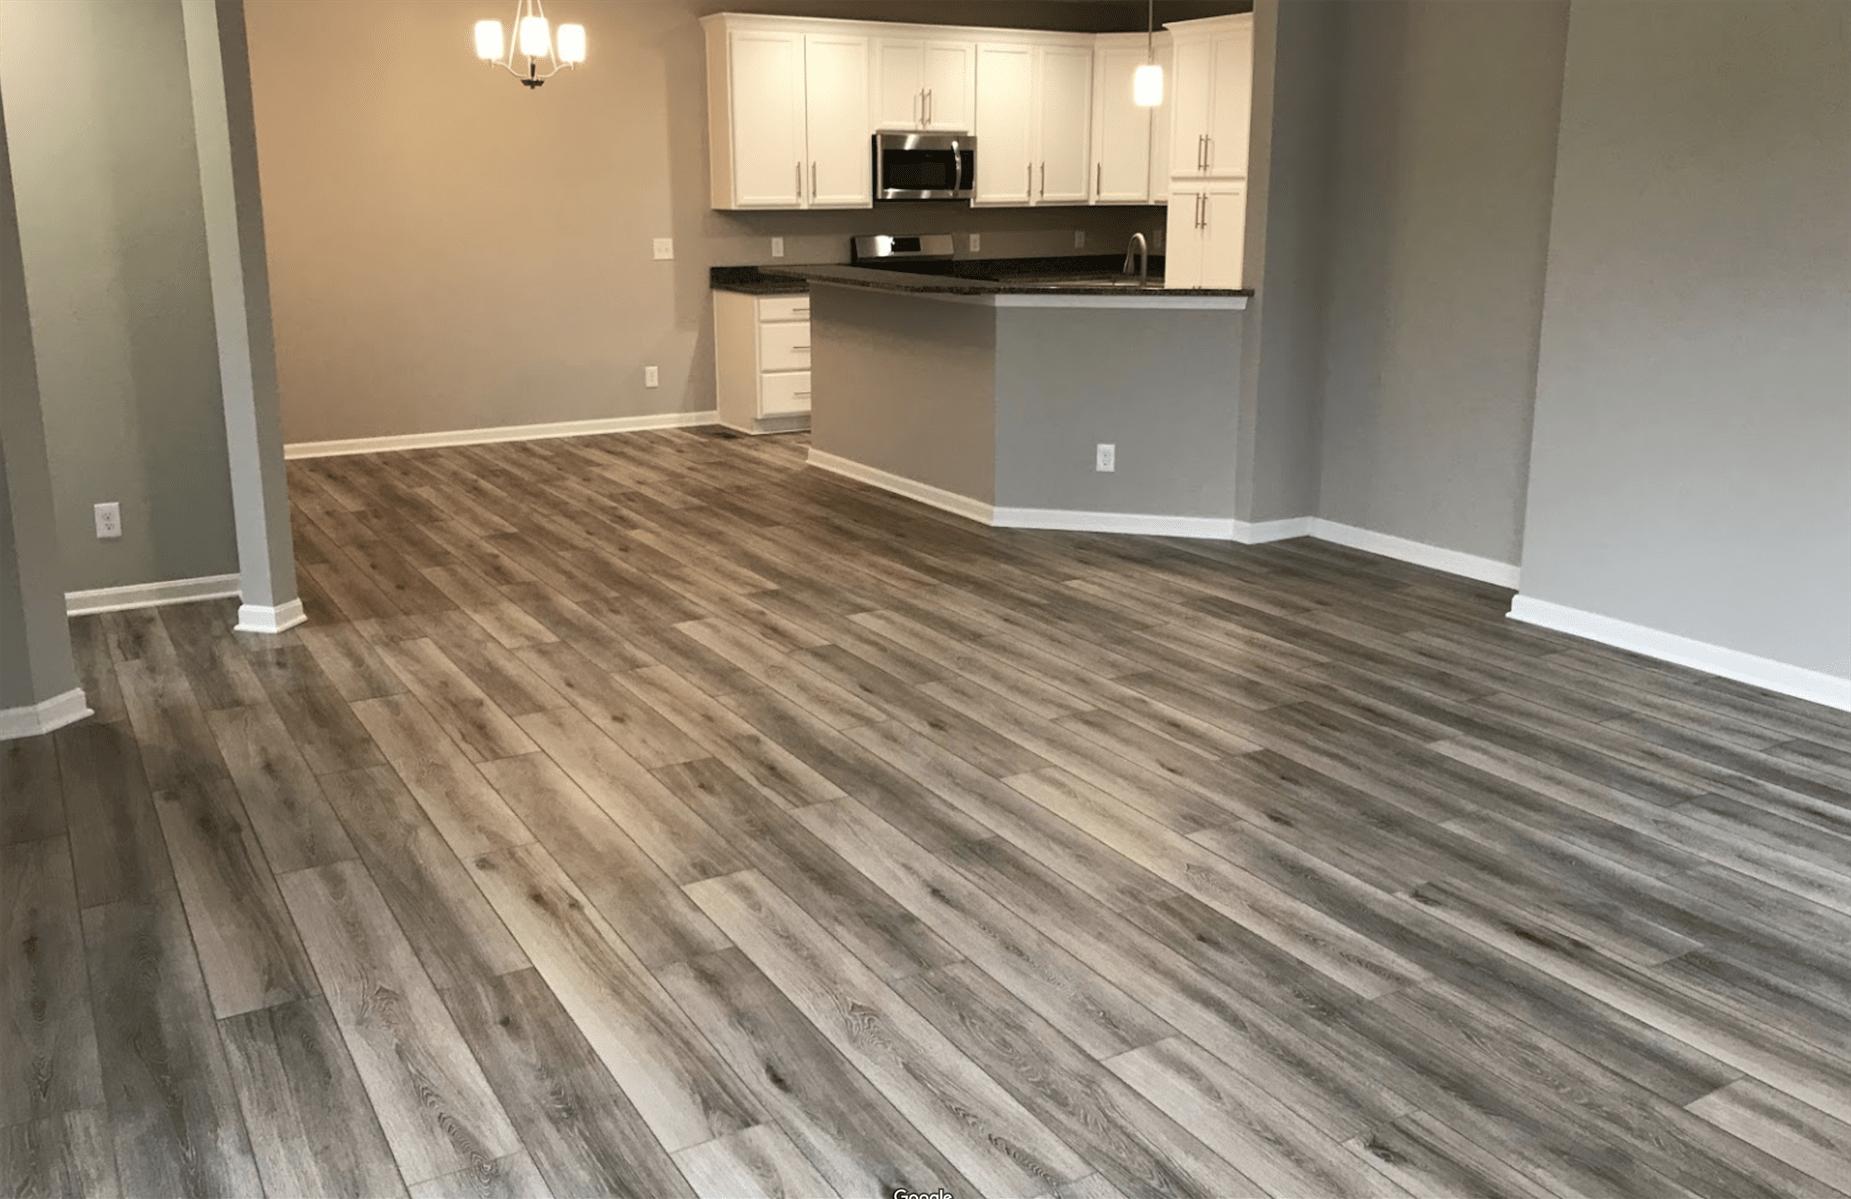 Hardwood flooring from Floorz in Copley, OH